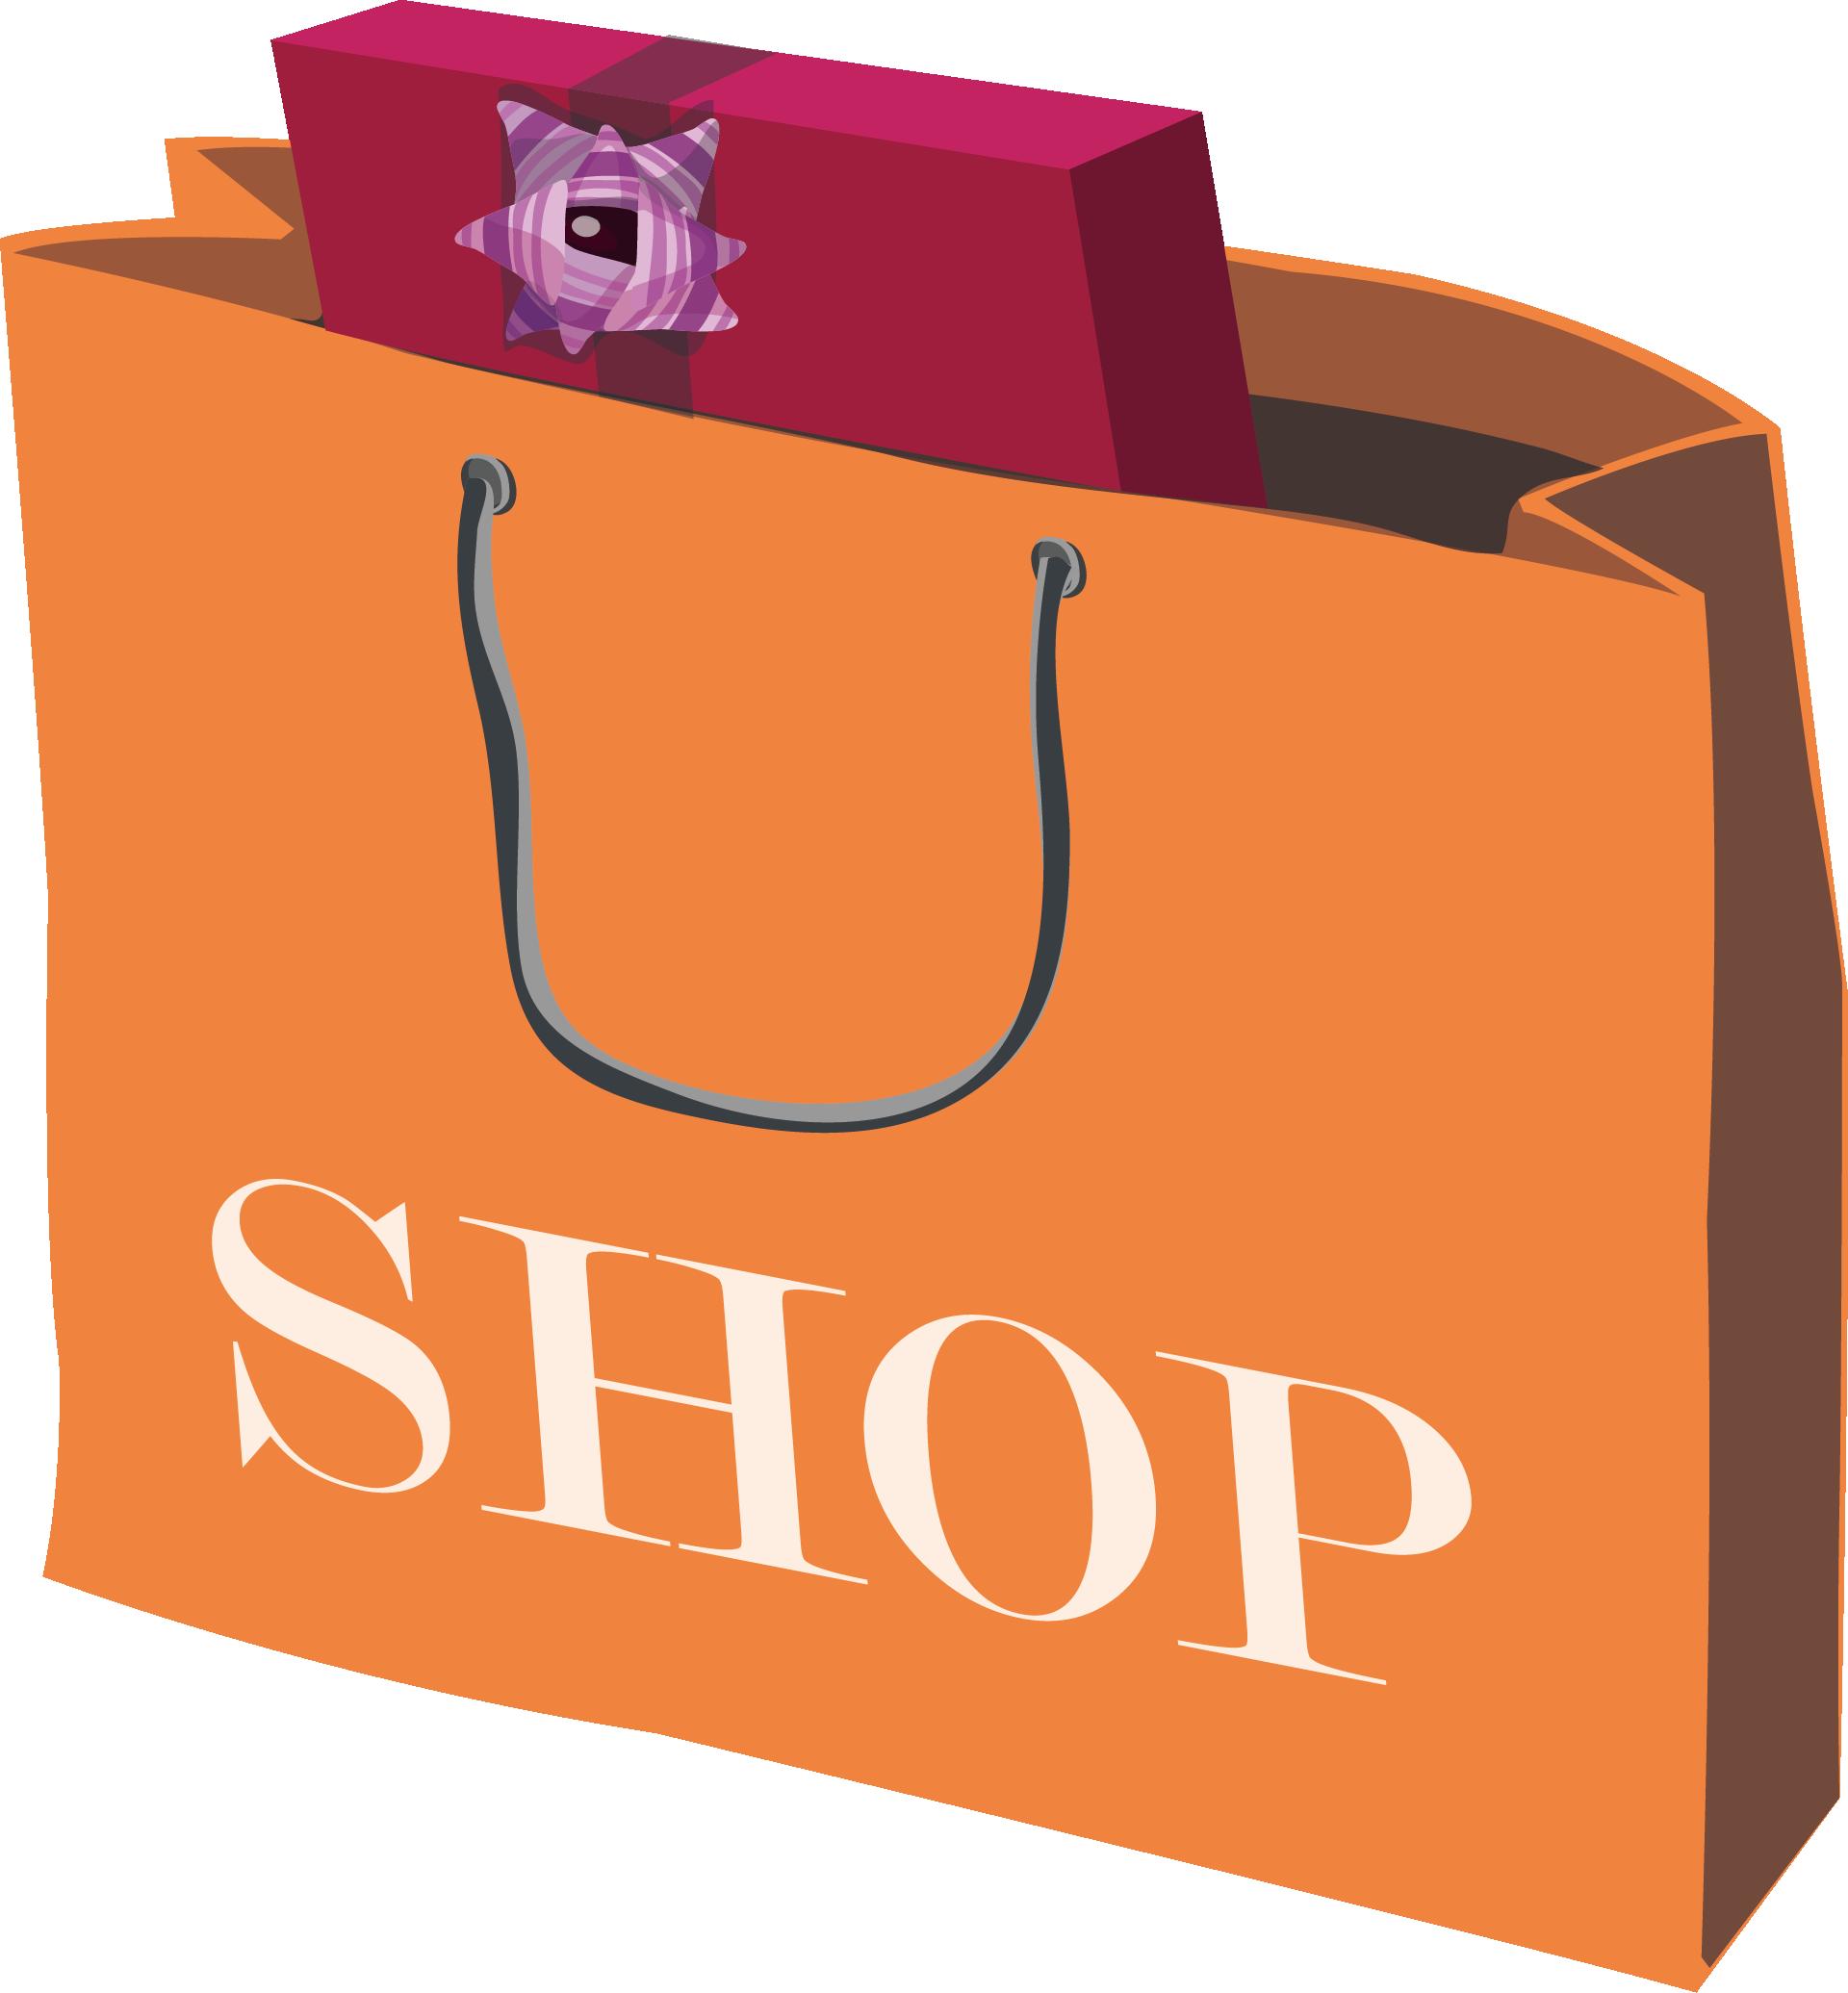 Gift clipart gift bag. Shopping paper clip art